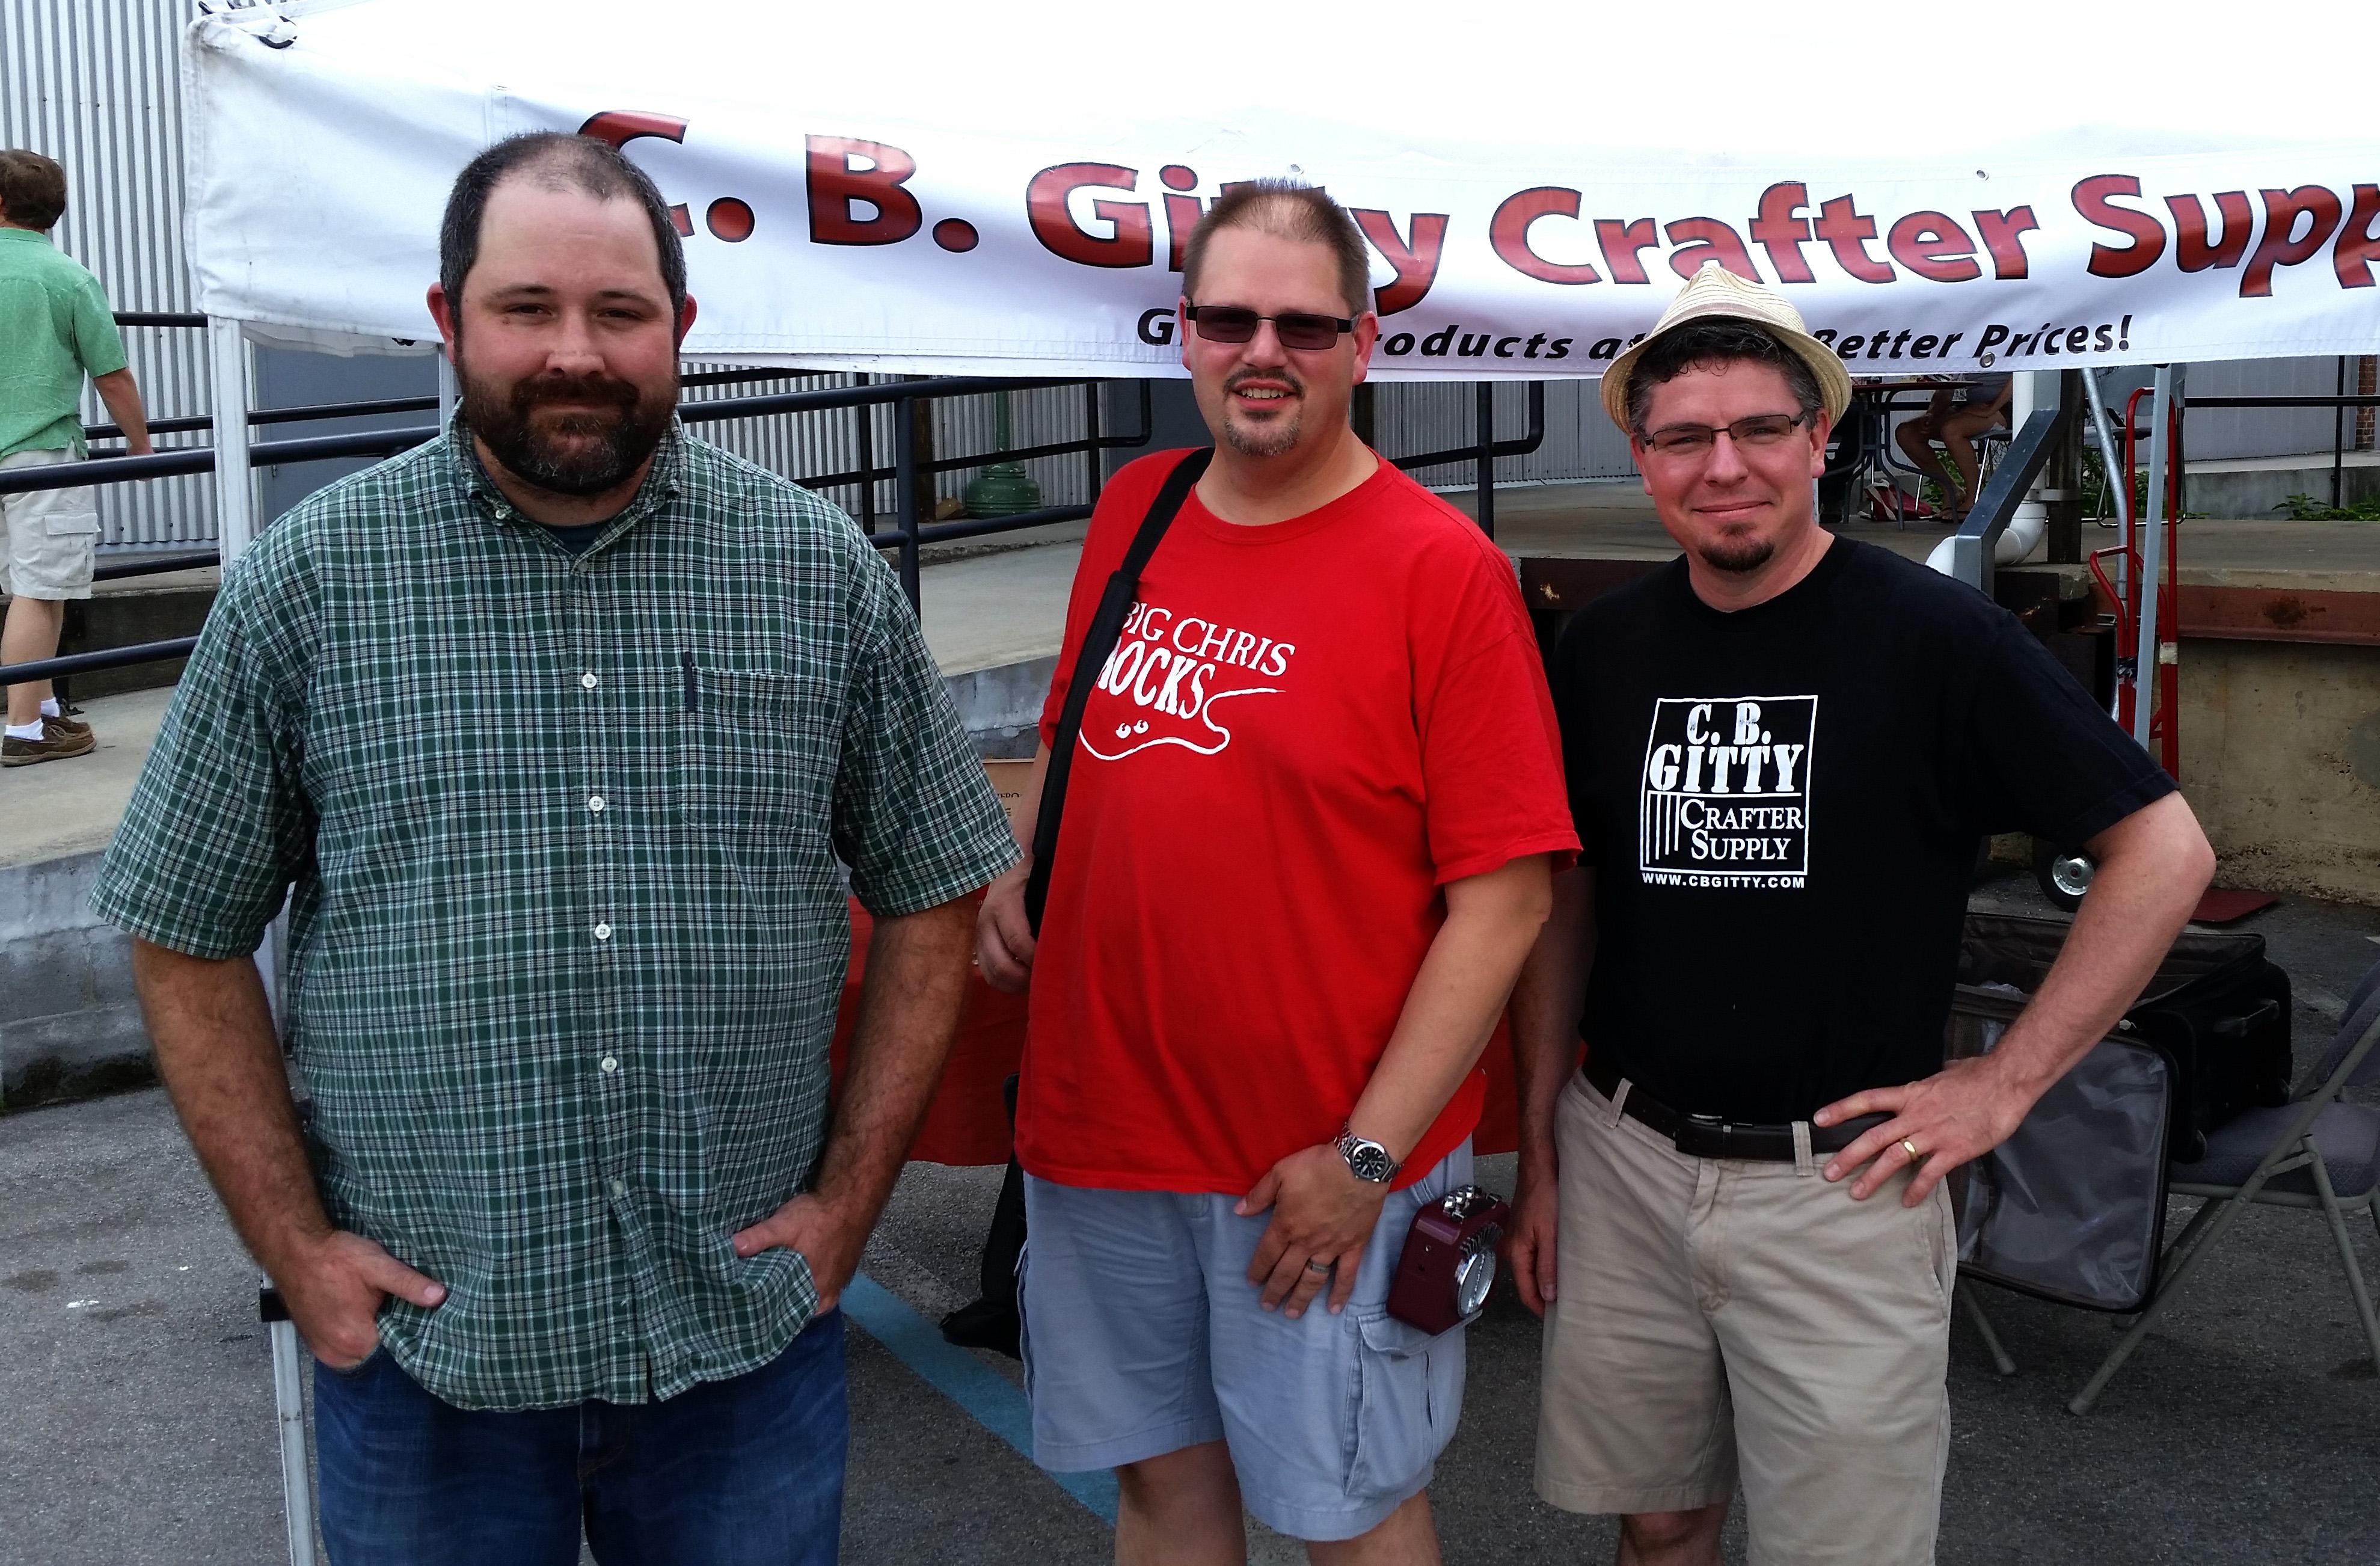 Jacob Blackwood, Chris Dickens and Gitty